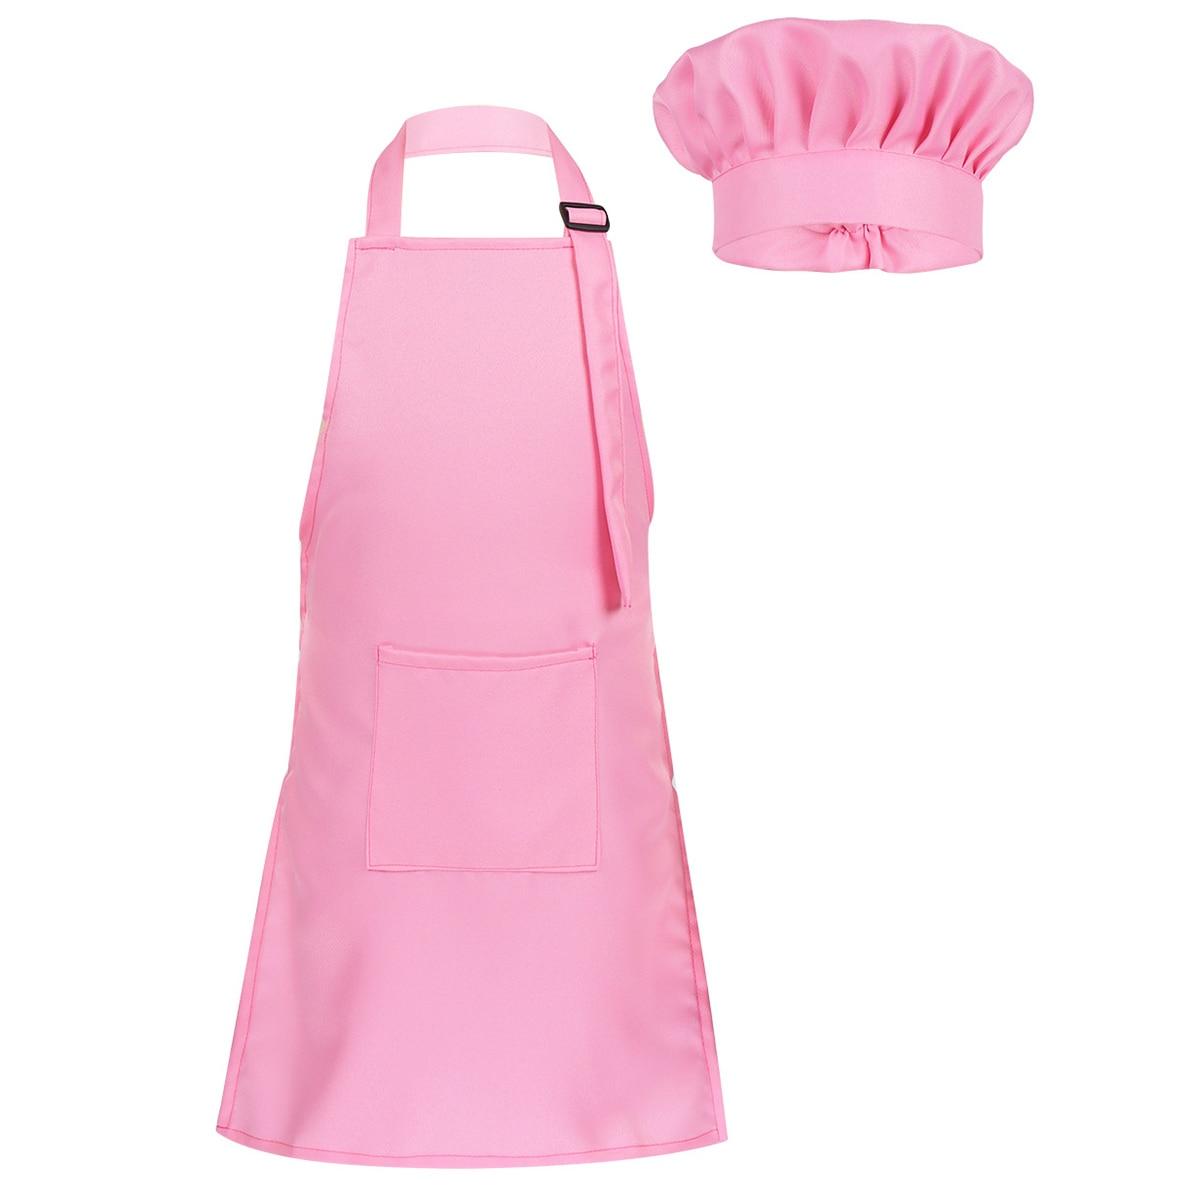 Child Kids Adjustable Apron and Chef Hat Set Kitchen Cooking Uniform Baking Painting Training Wear Boys Girls Halloween Costume